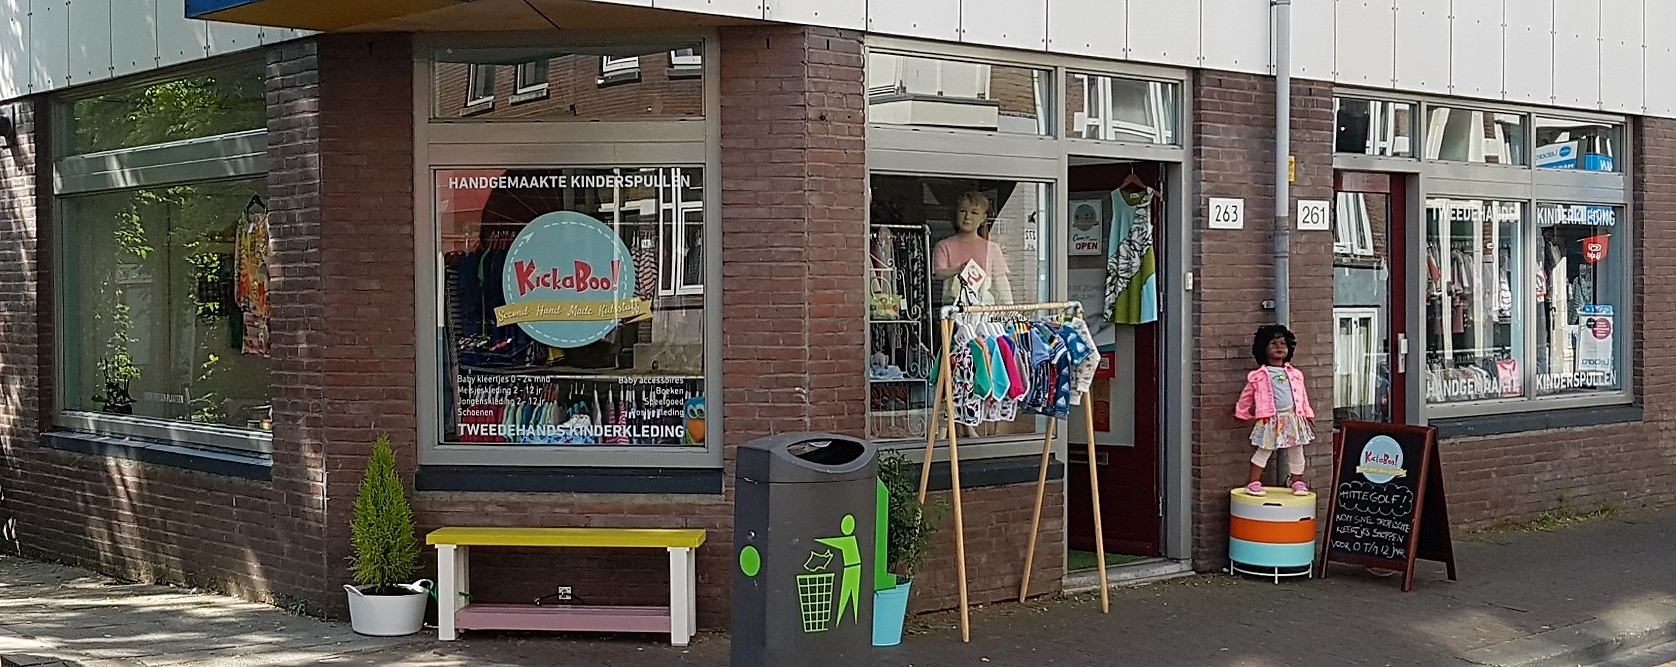 Kinderkleding Rotterdam.Tweedehands Kinderkleding Rotterdam Kickaboo